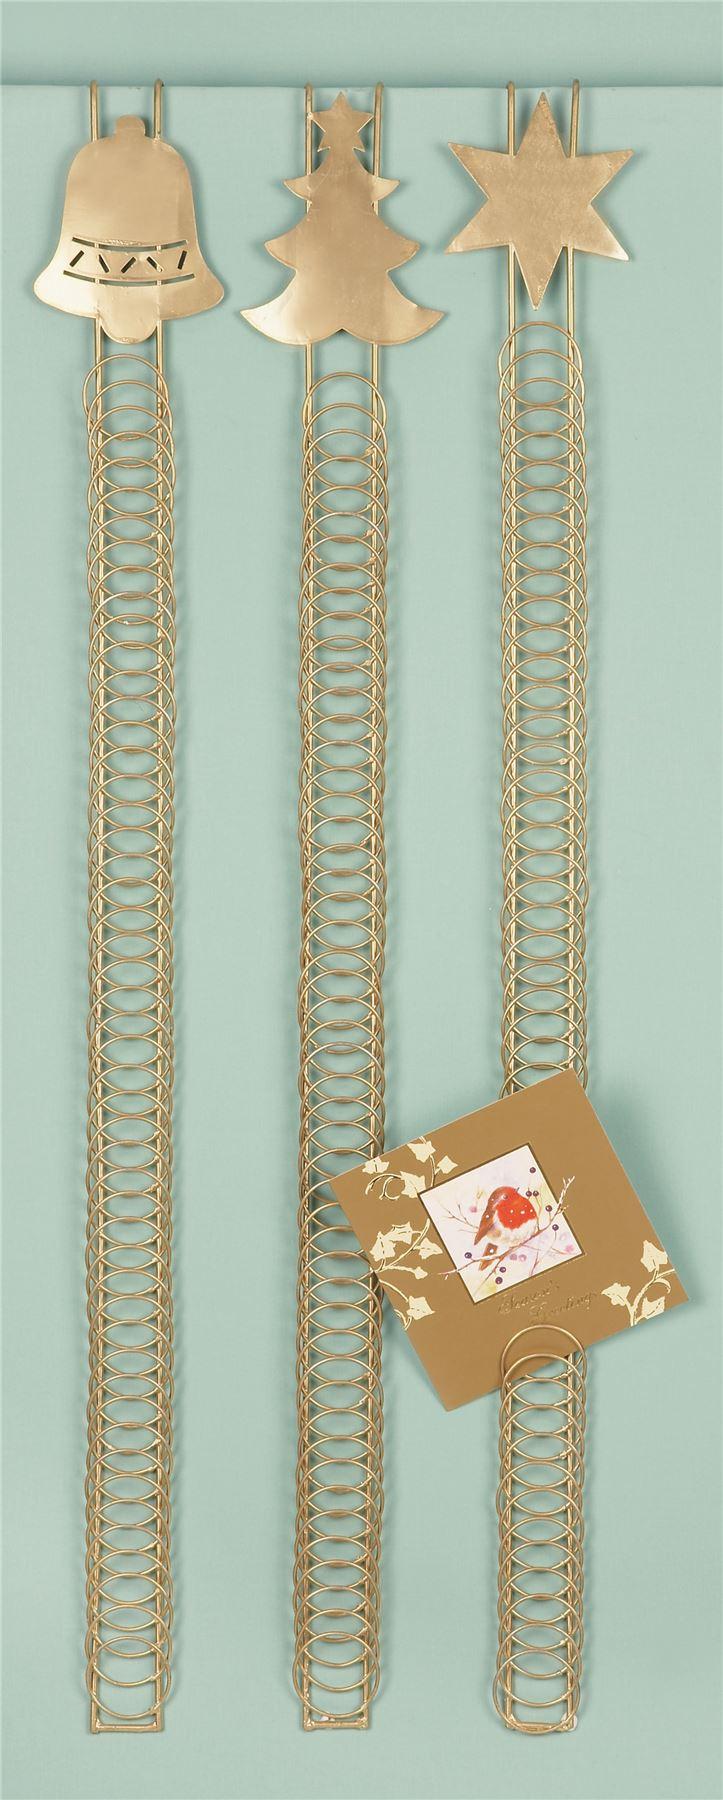 90cm 50 Card Over Door Card Holder Xmas Christmas Hanging